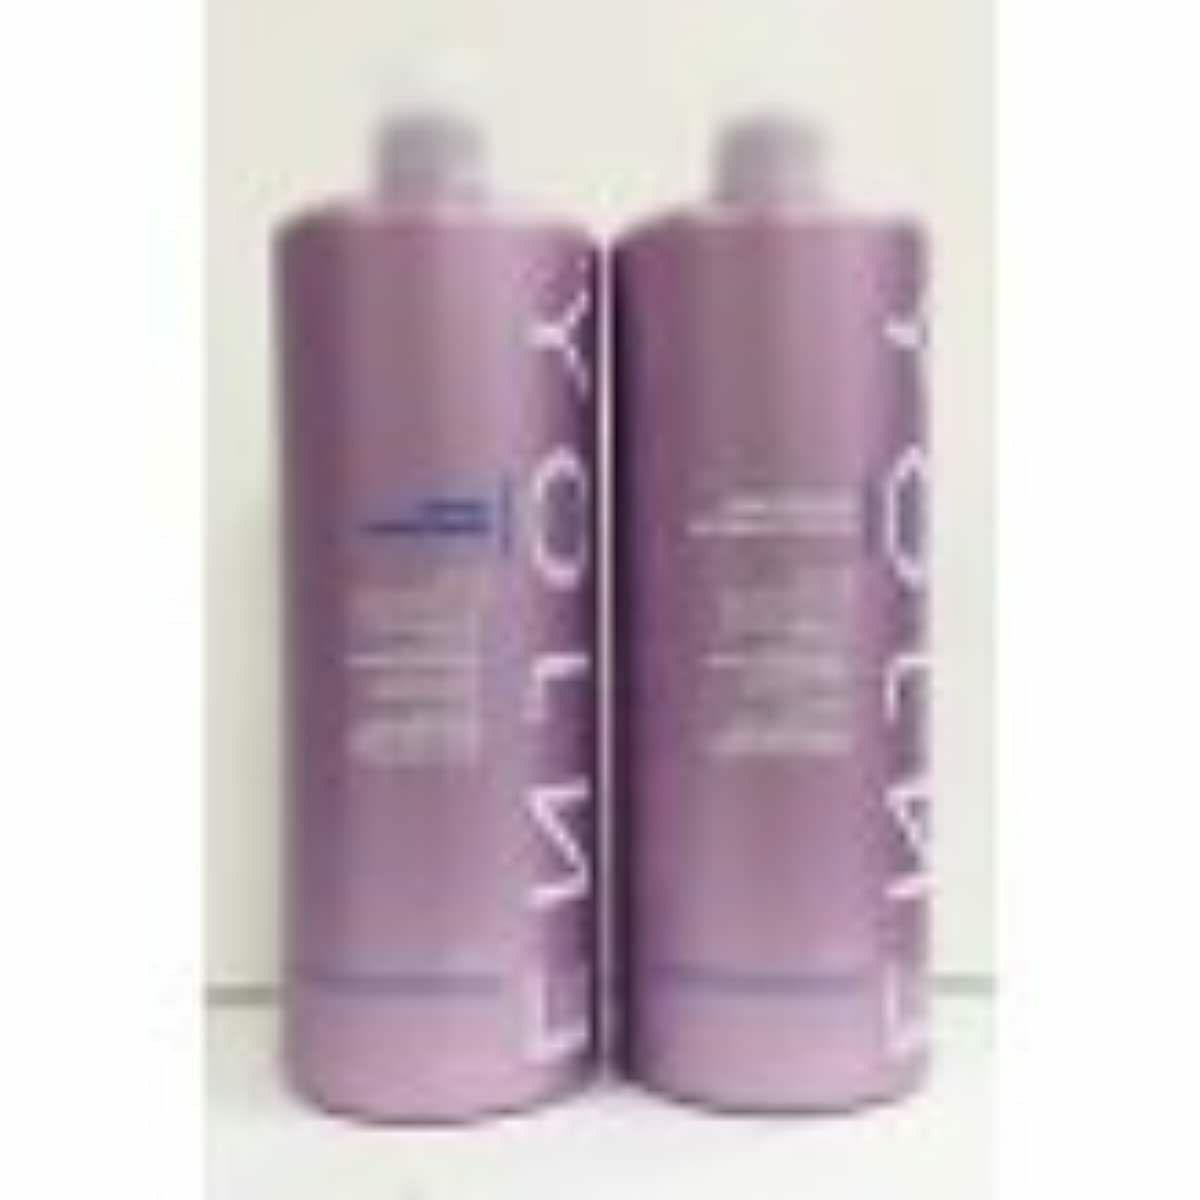 Enjoy Sulfate-Free Luxury Shampoo and Luxury Conditioner 33.